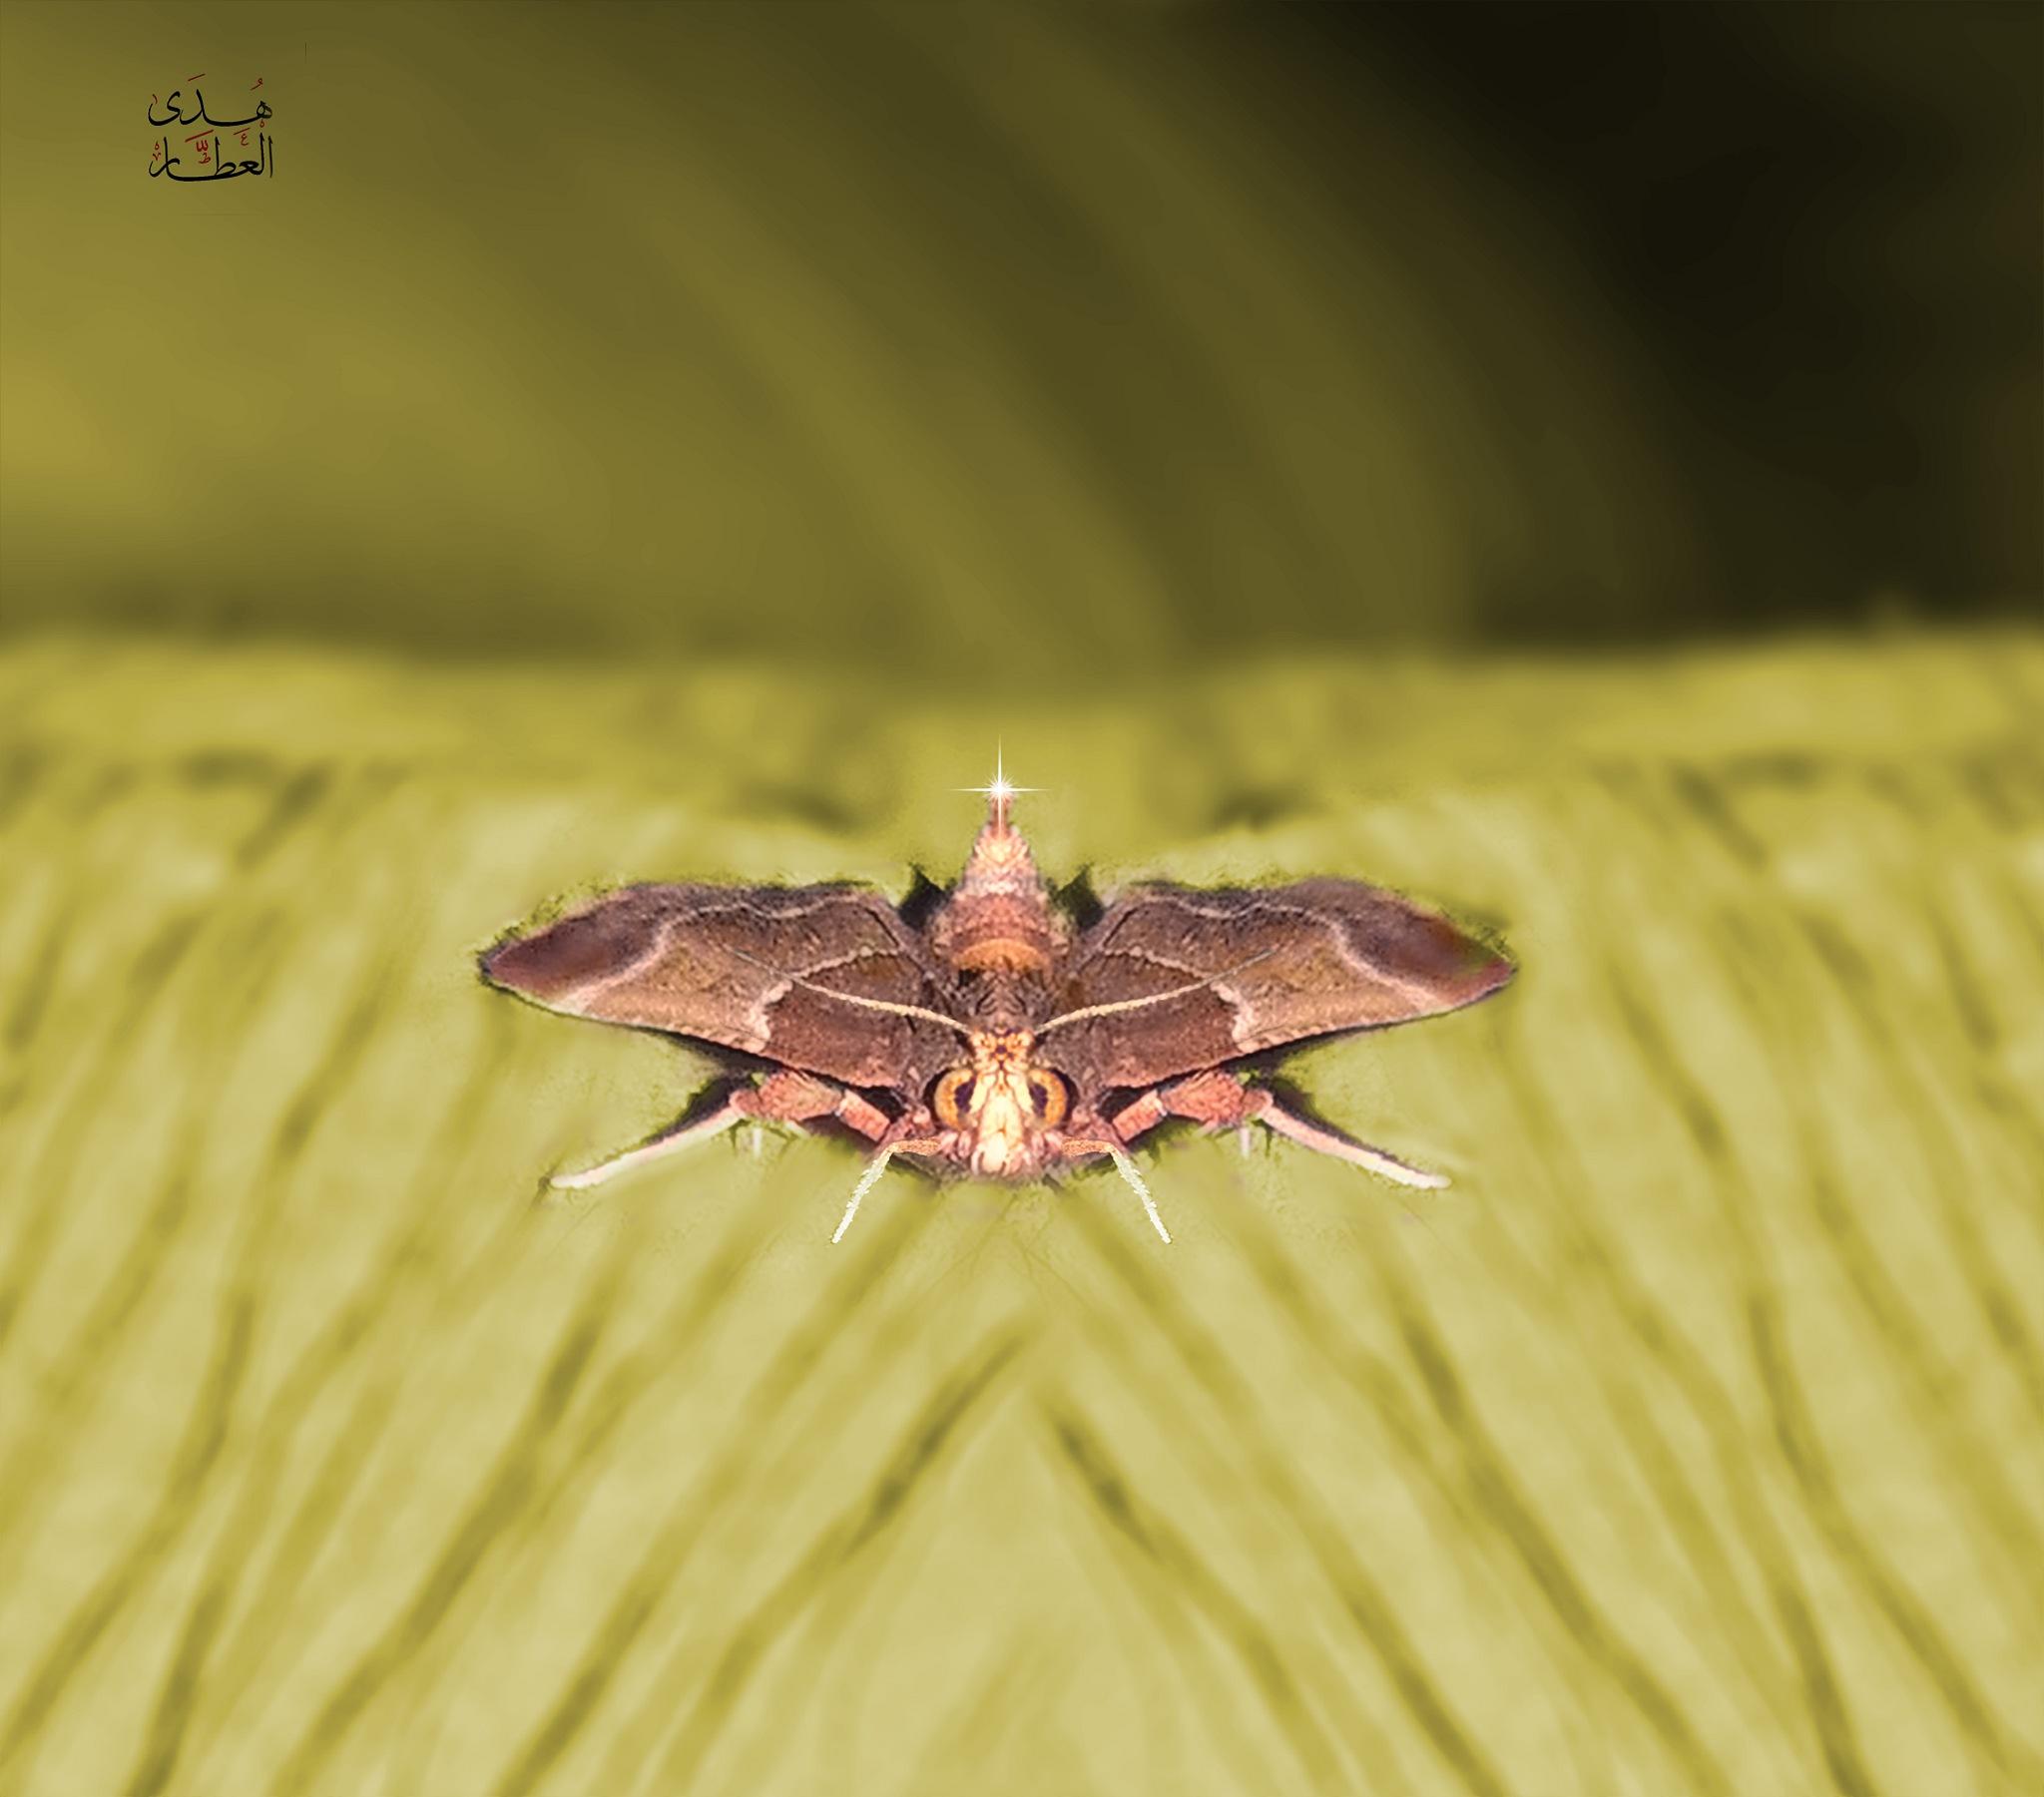 I captured it in my Room :) by Hoda Elattar